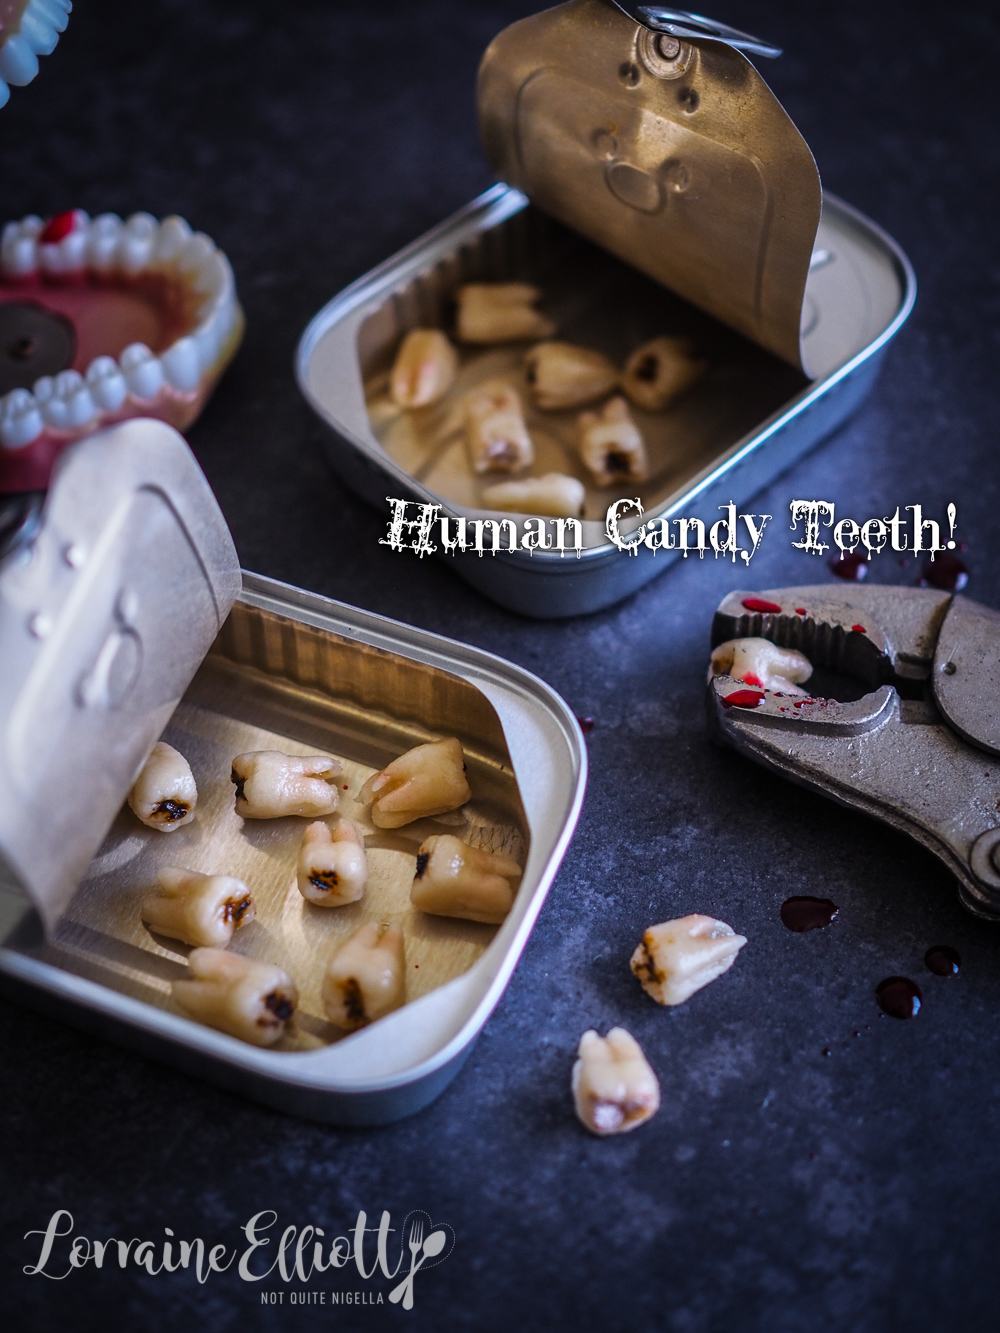 Human teeth silicon mold marzipan